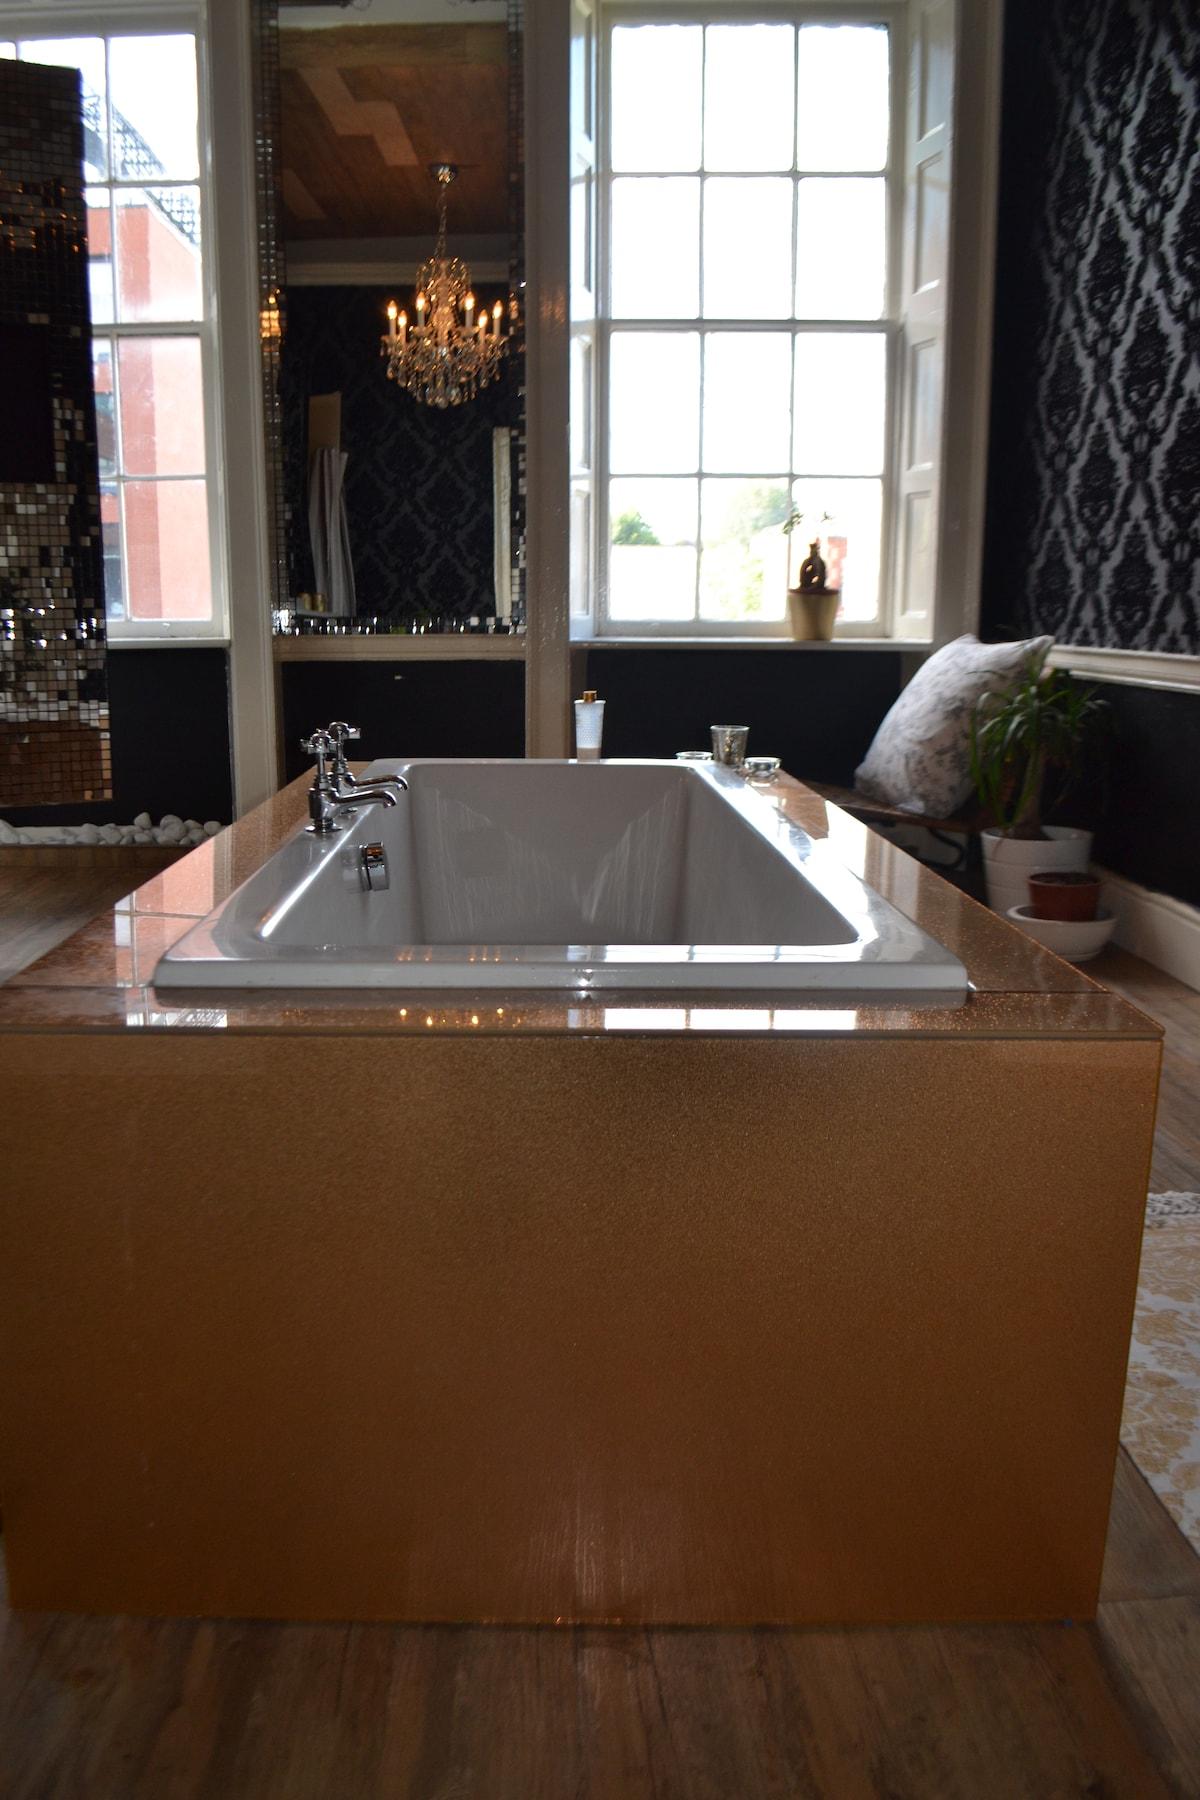 Golden bath with big pressure